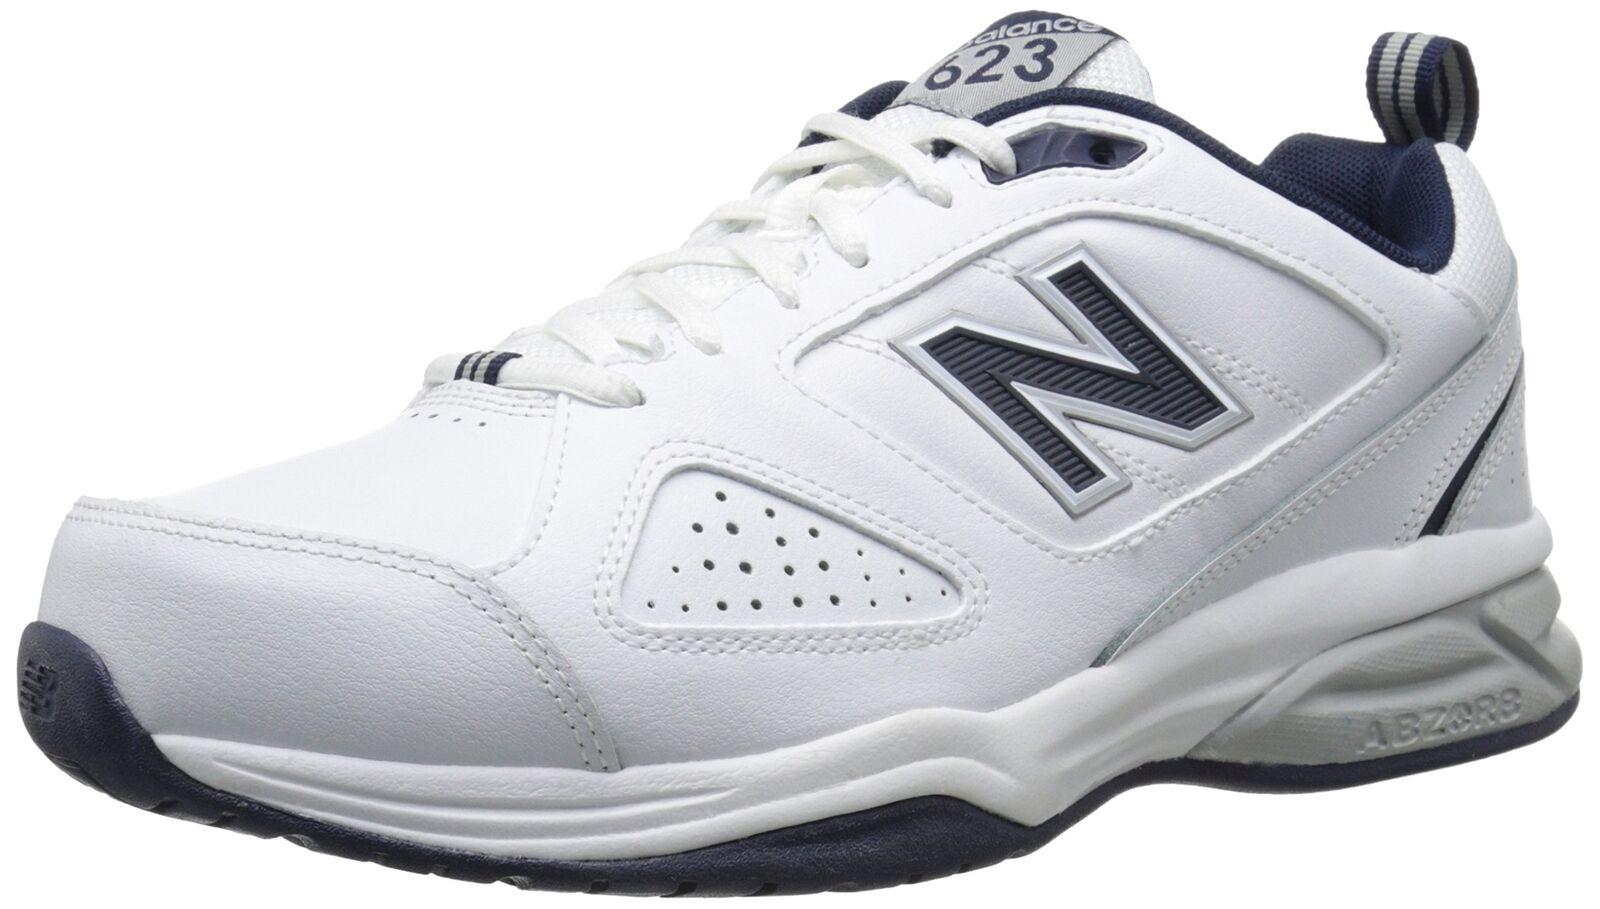 New Balance Men's MX623v3 Training shoes White Navy 10.5 2E US